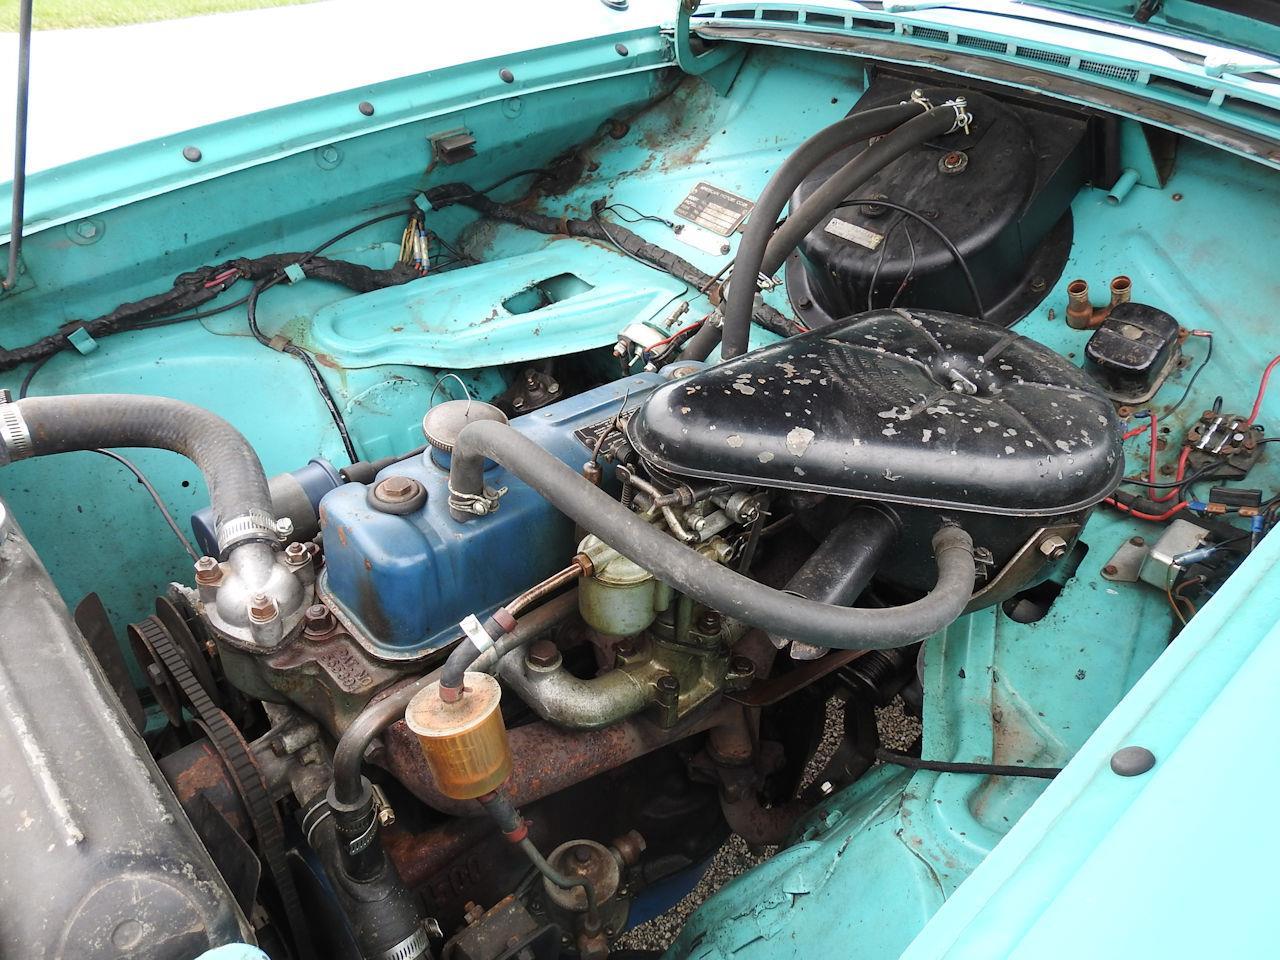 Large Picture of Classic '57 Nash Metropolitan located in Kenosha Wisconsin - $12,995.00 - OOM4